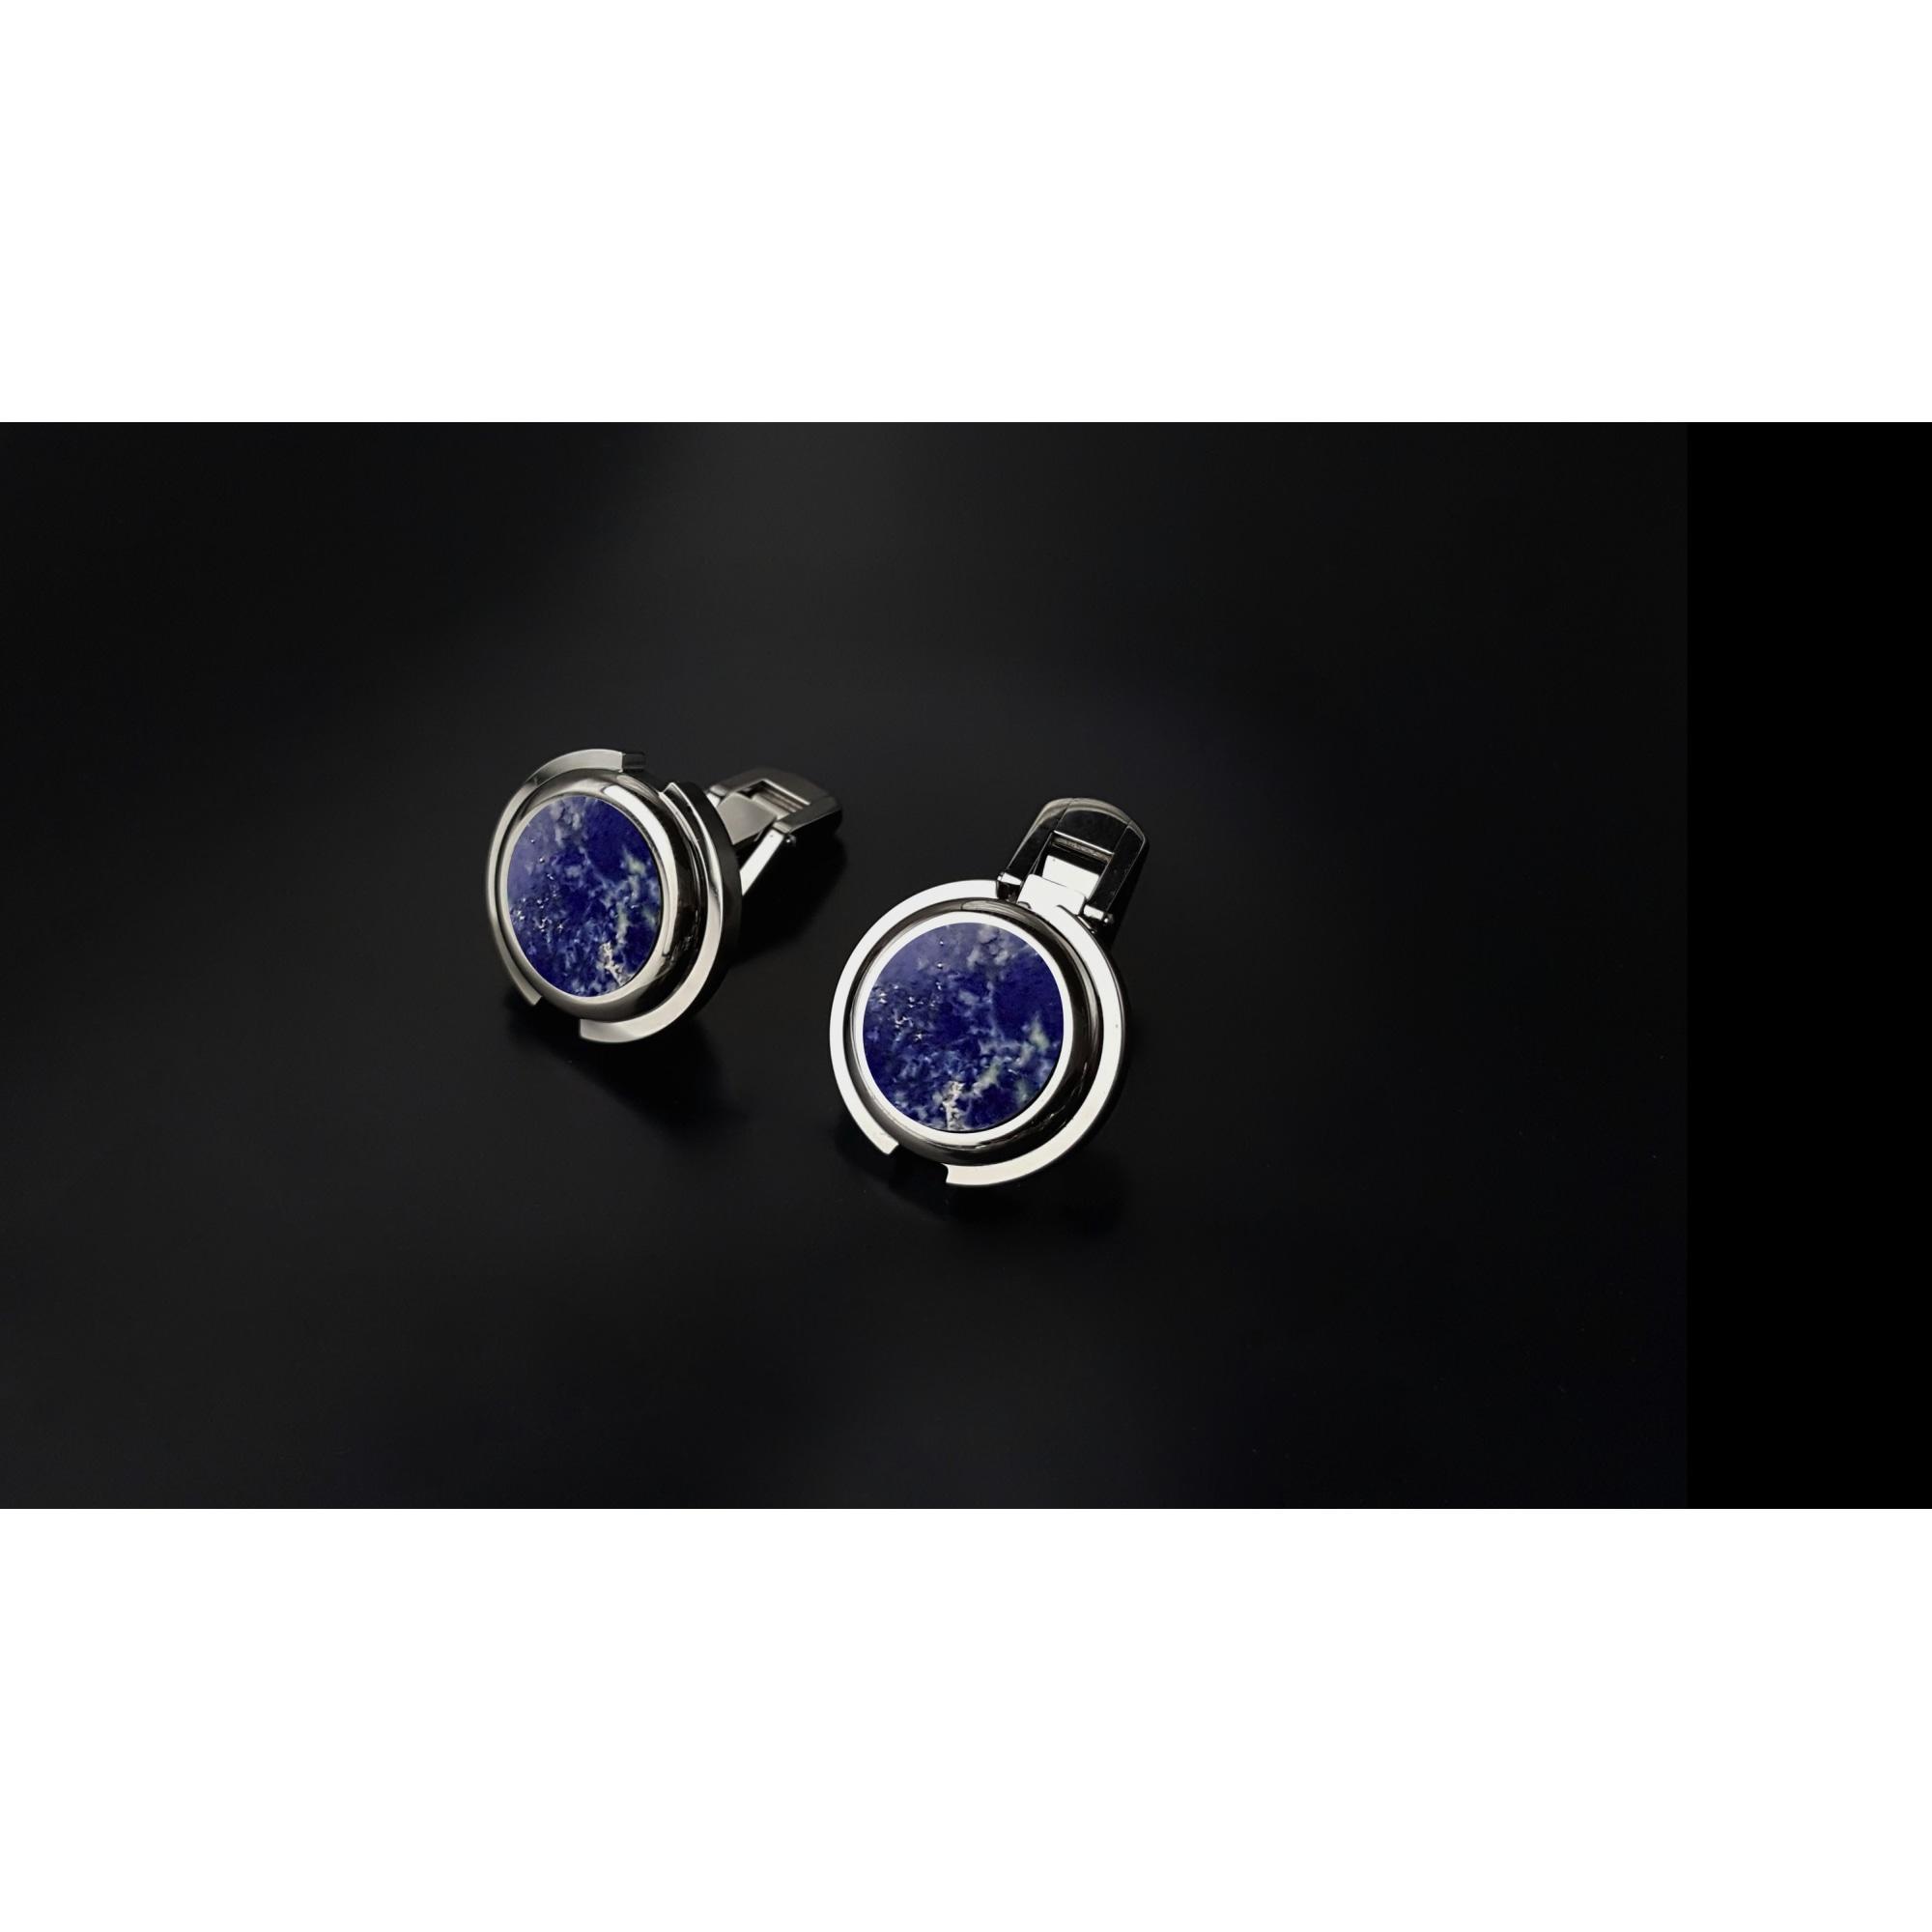 Gemelli COLLATERALS Blu, blu navy, turchese